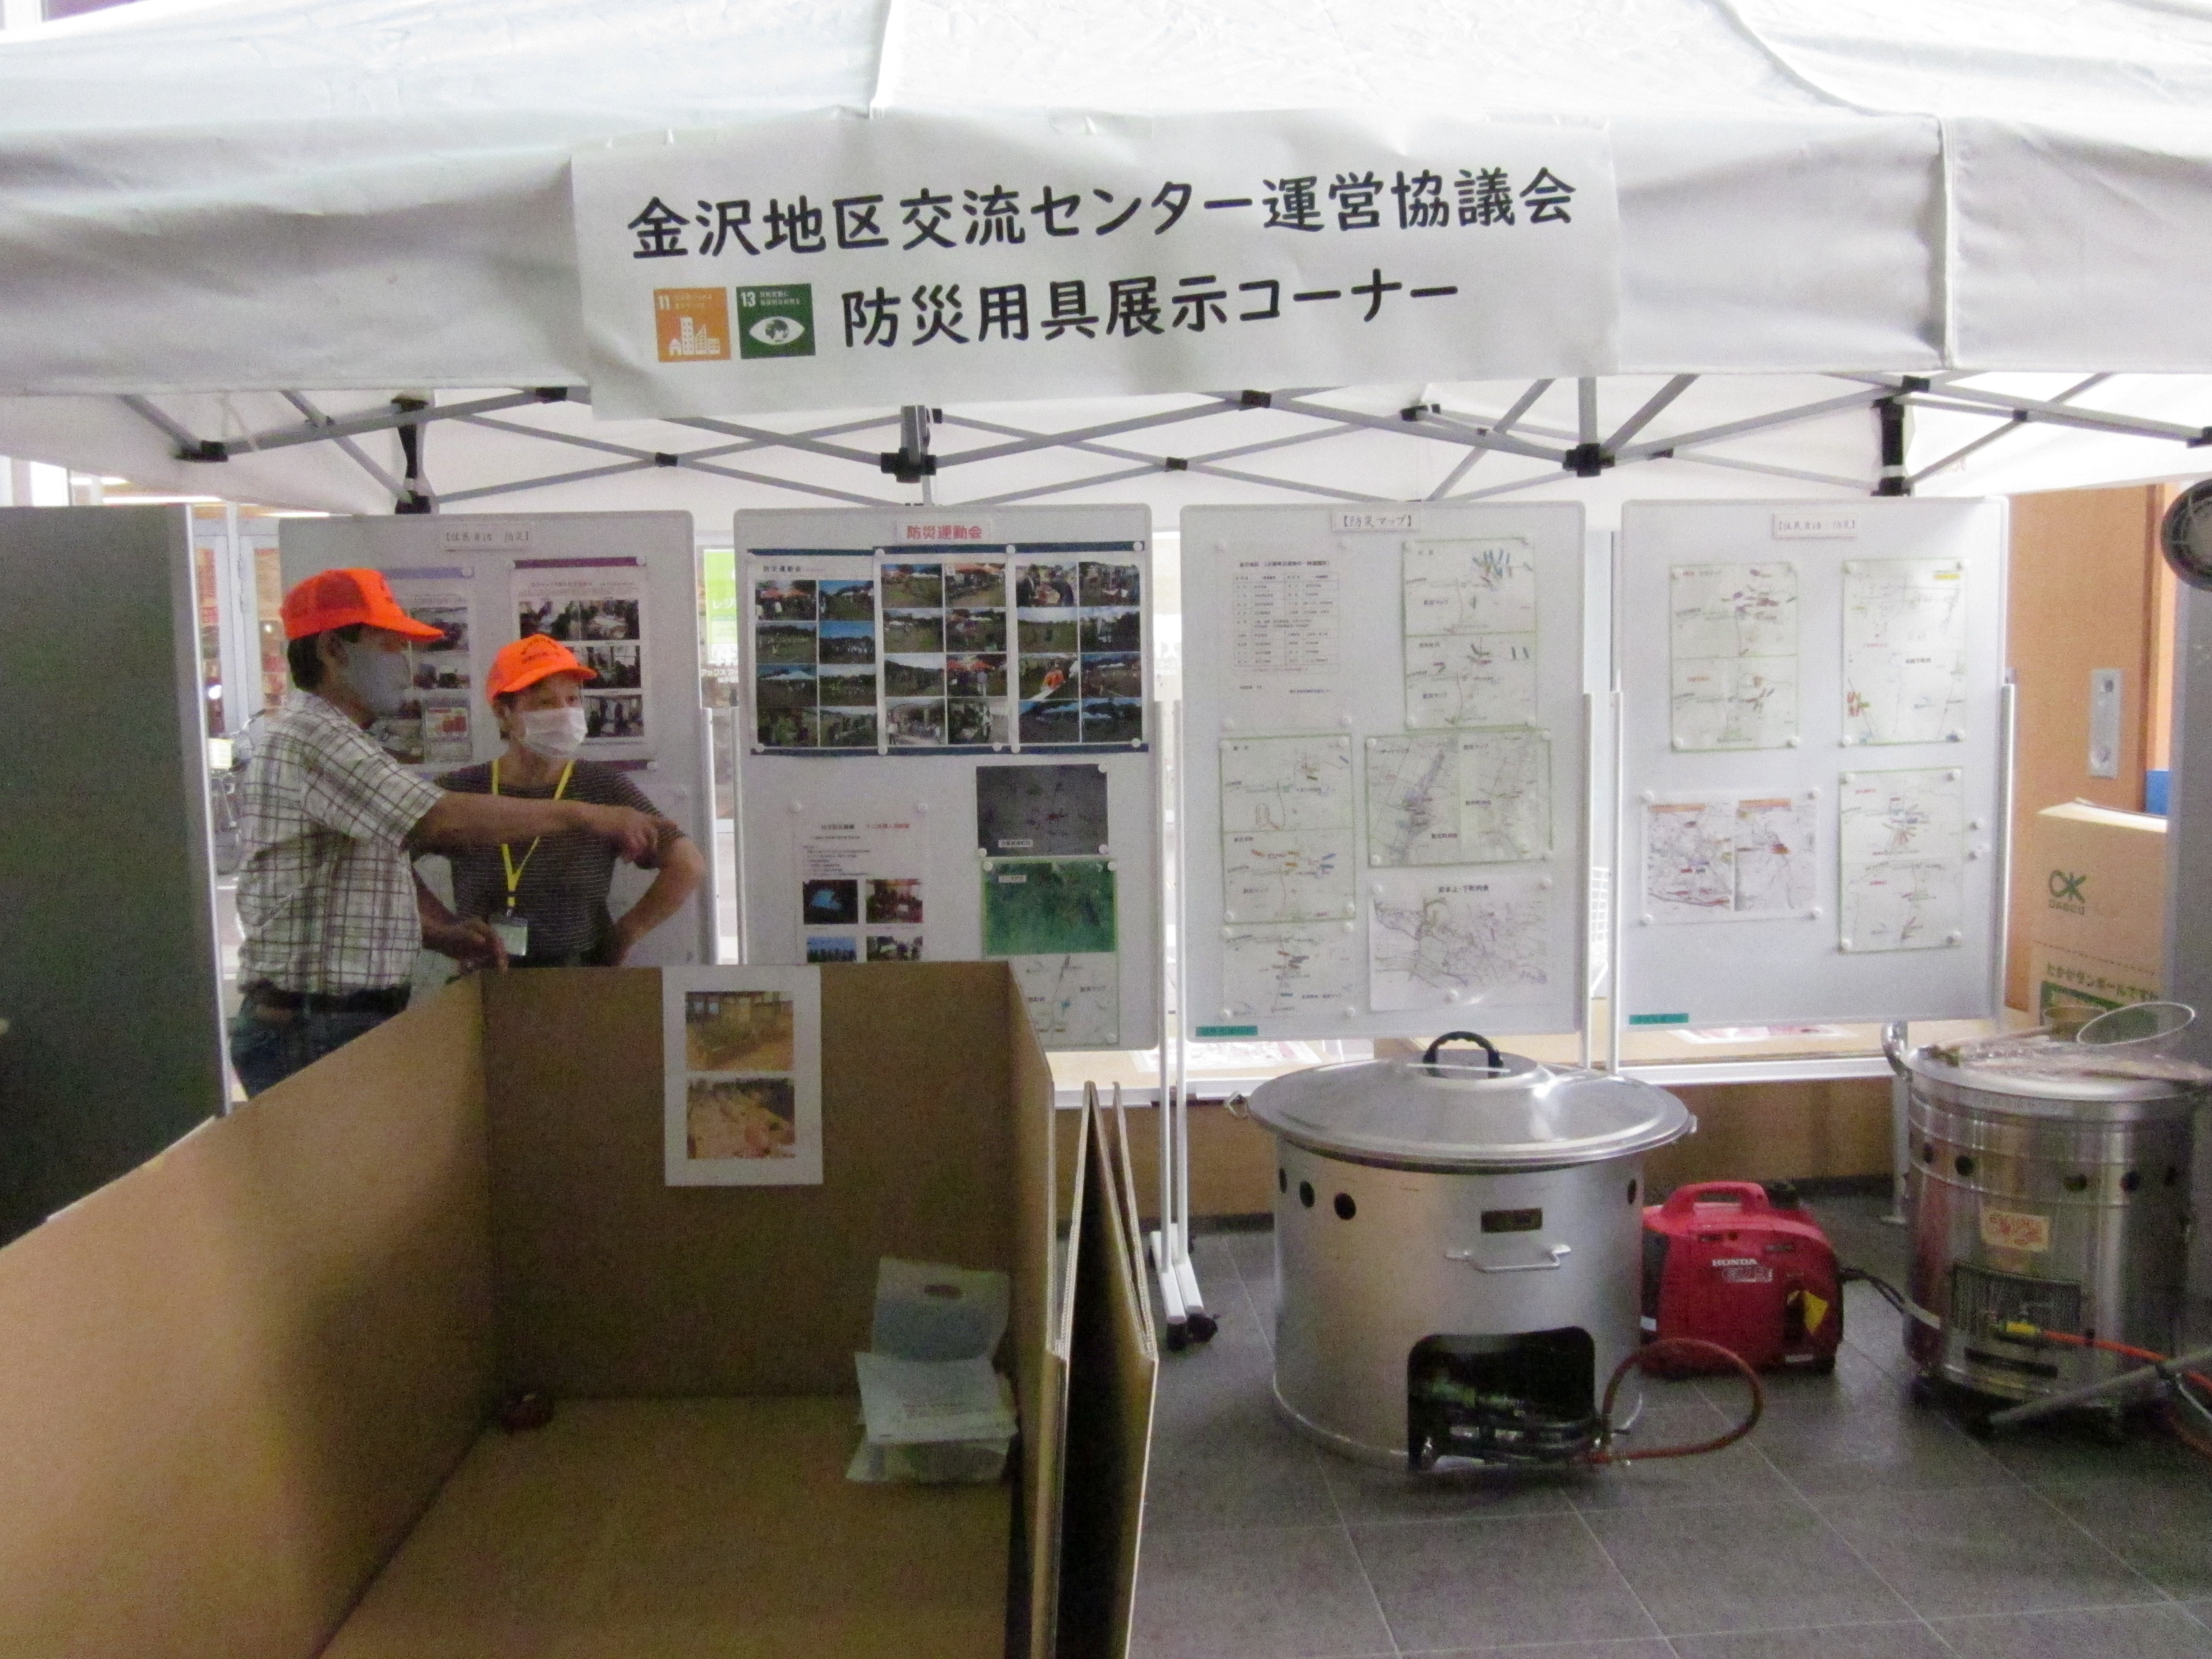 http://www.akita-south-jender.org/news/IMG_%E9%87%91%E6%B2%A2.JPG